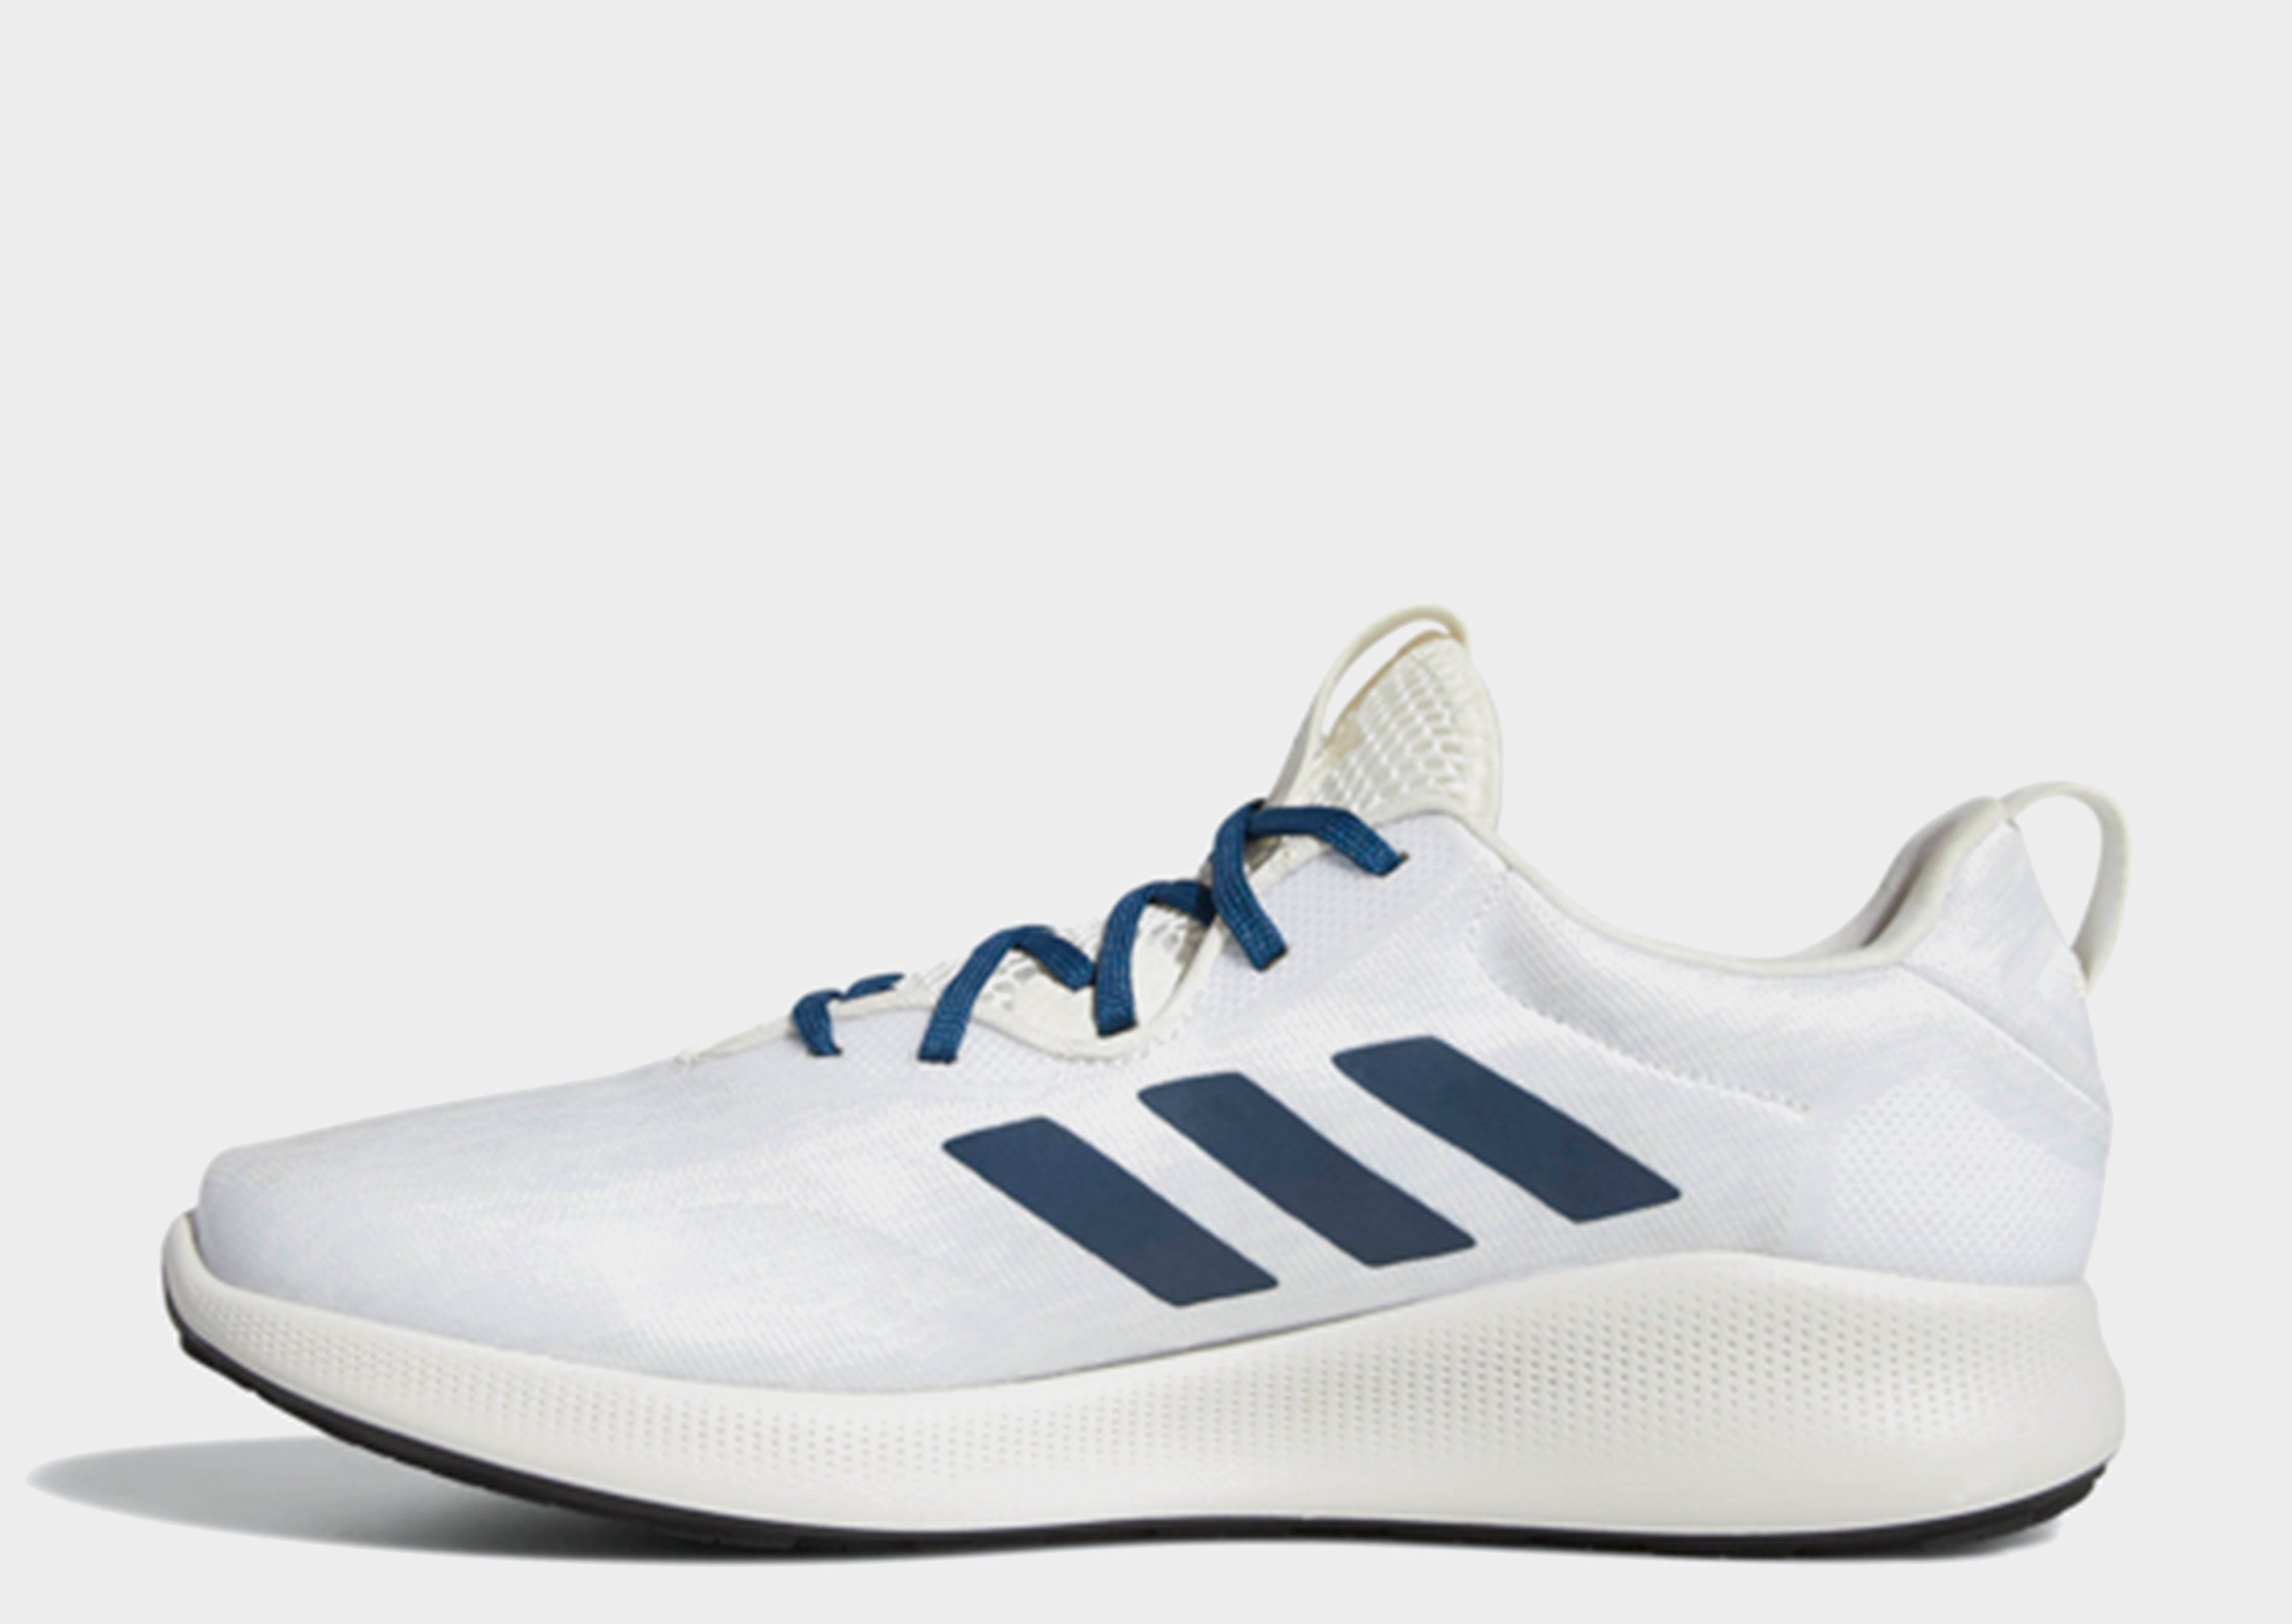 d9a749e5d93c8c ADIDAS Purebounce+ Street Shoes